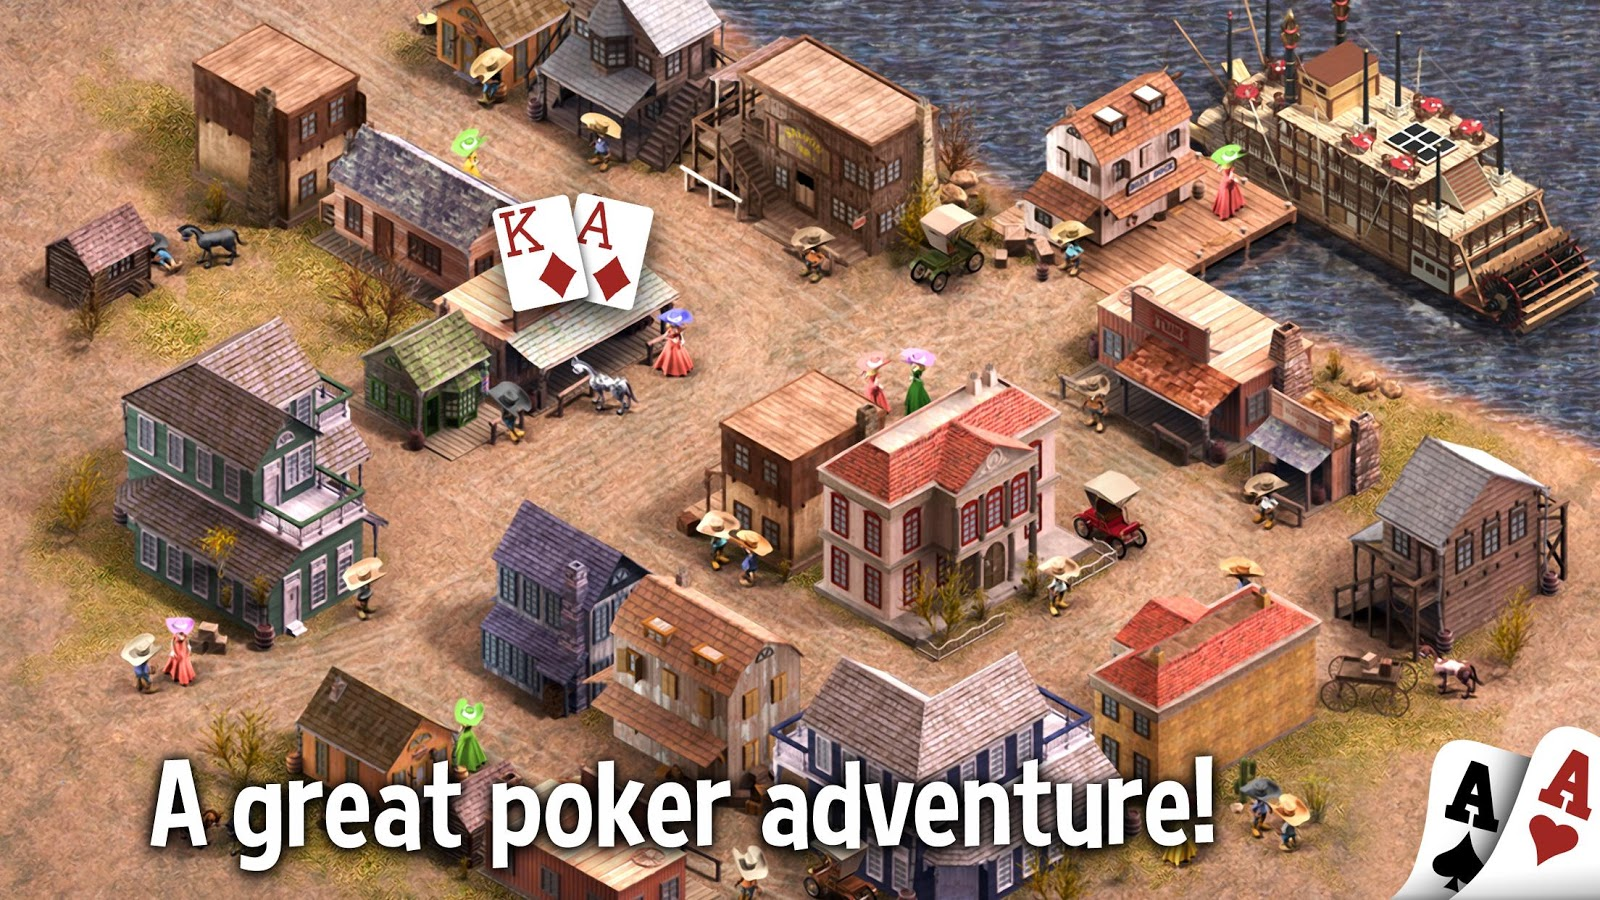 Governor of poker 2 apk 2shared